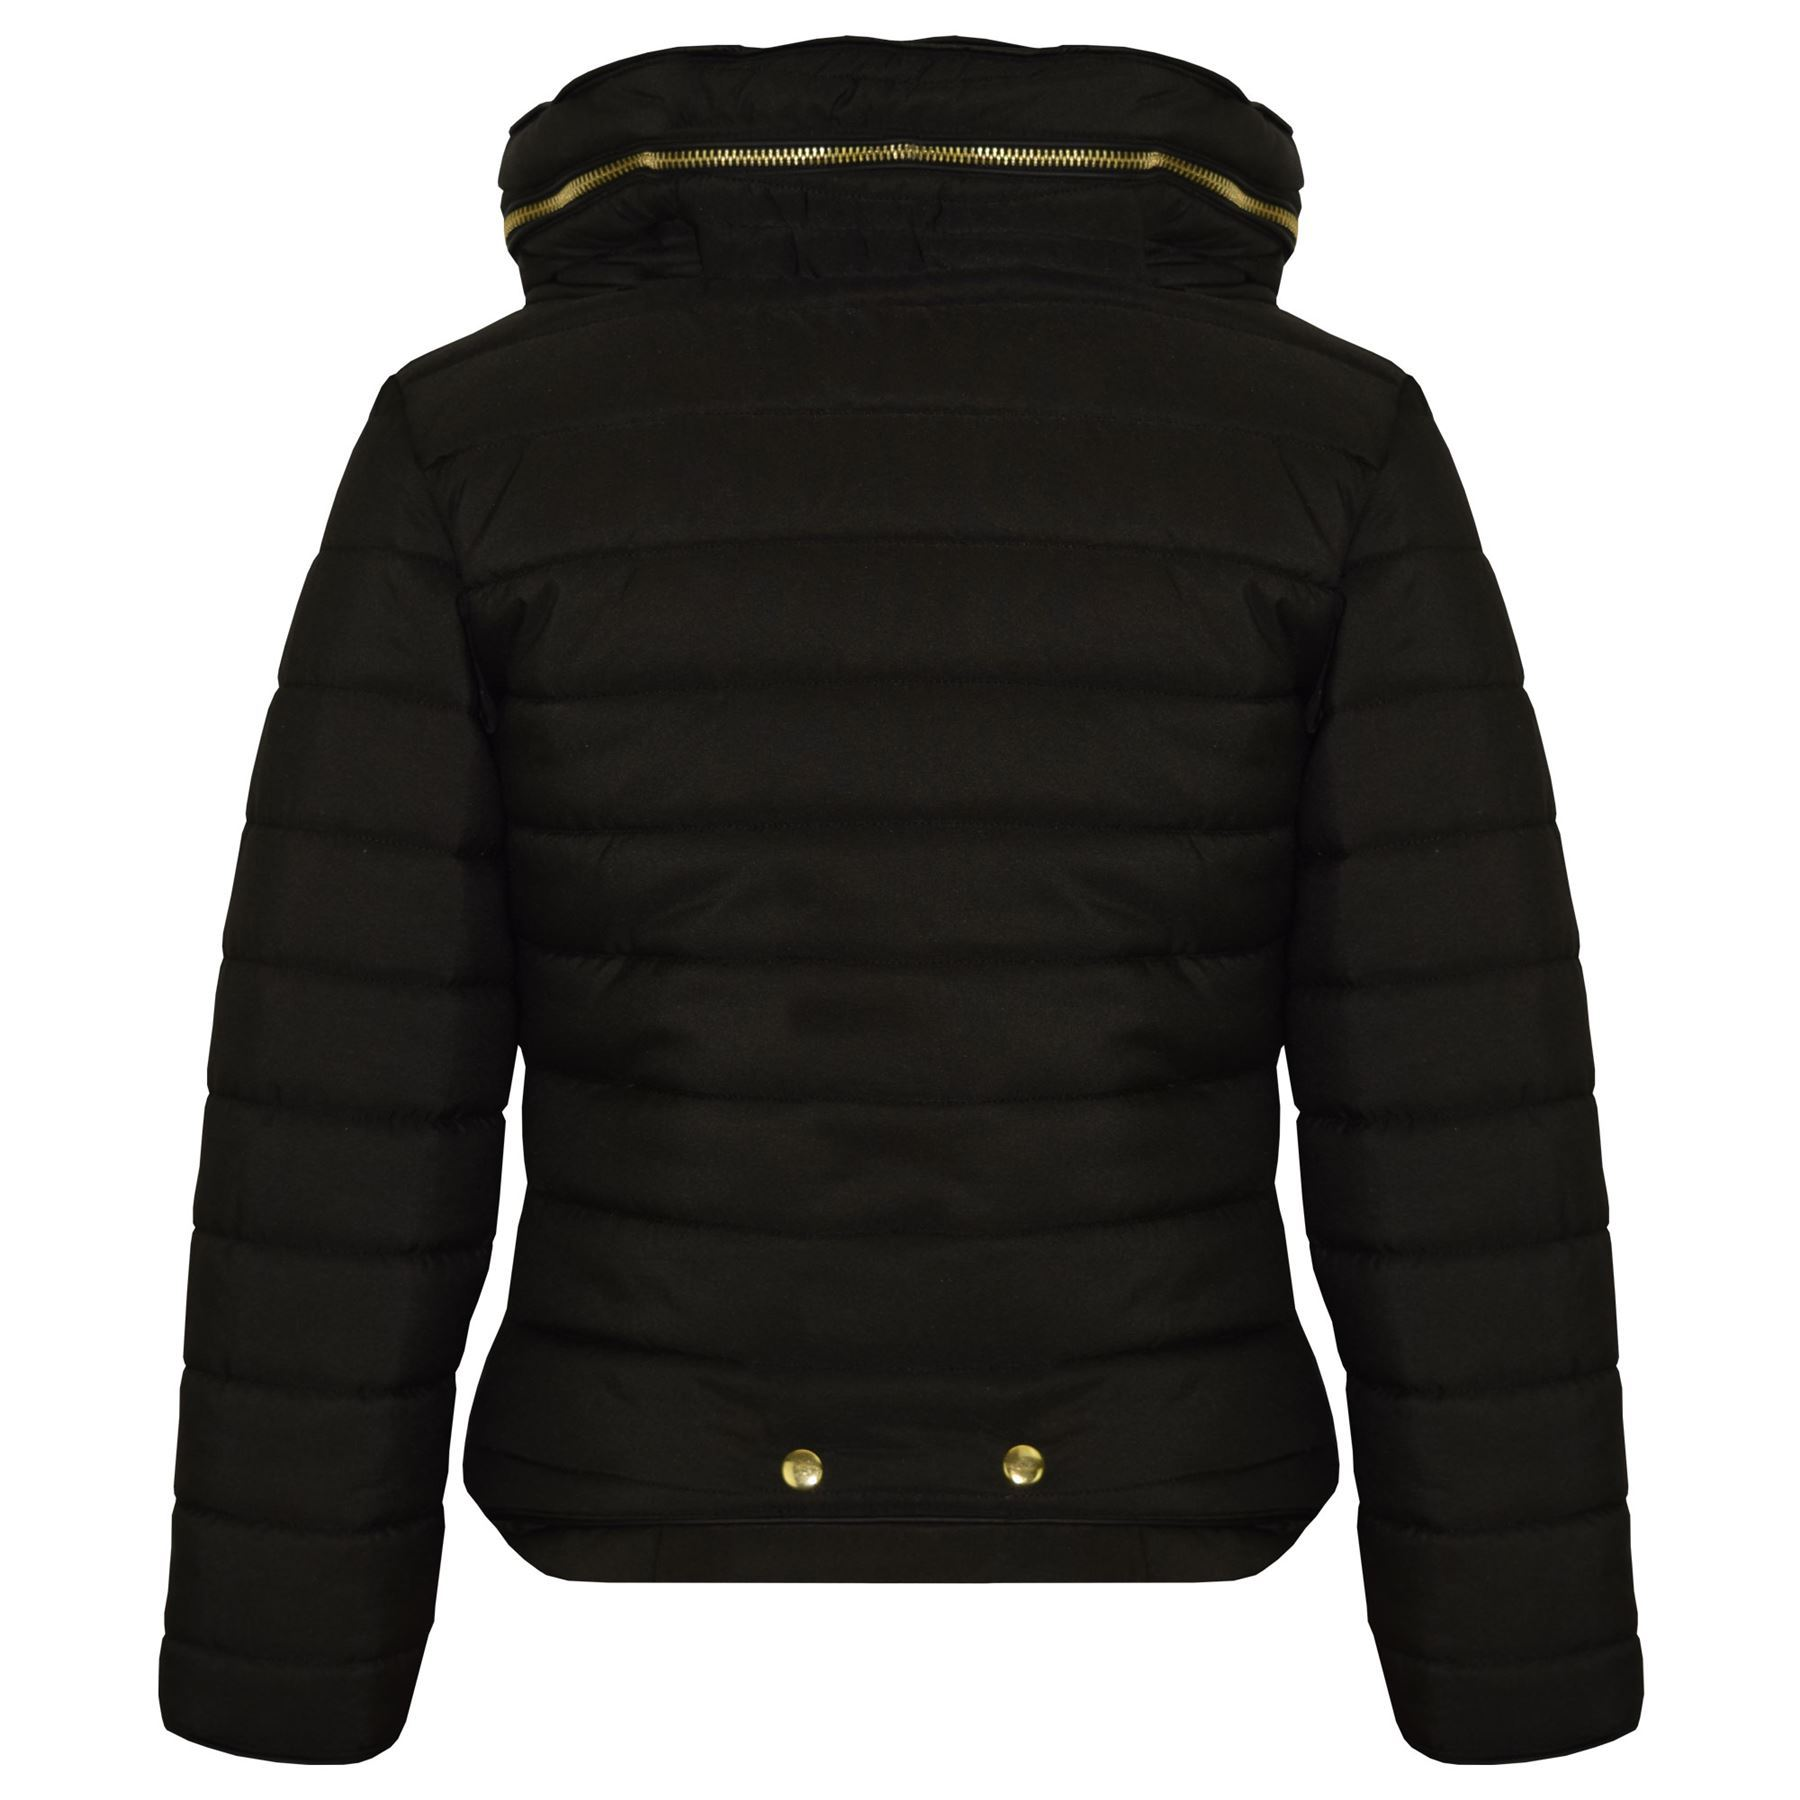 77f576074b66 Girls Jacket Kids Padded Black Puffer Bubble Fur Collar Back To ...